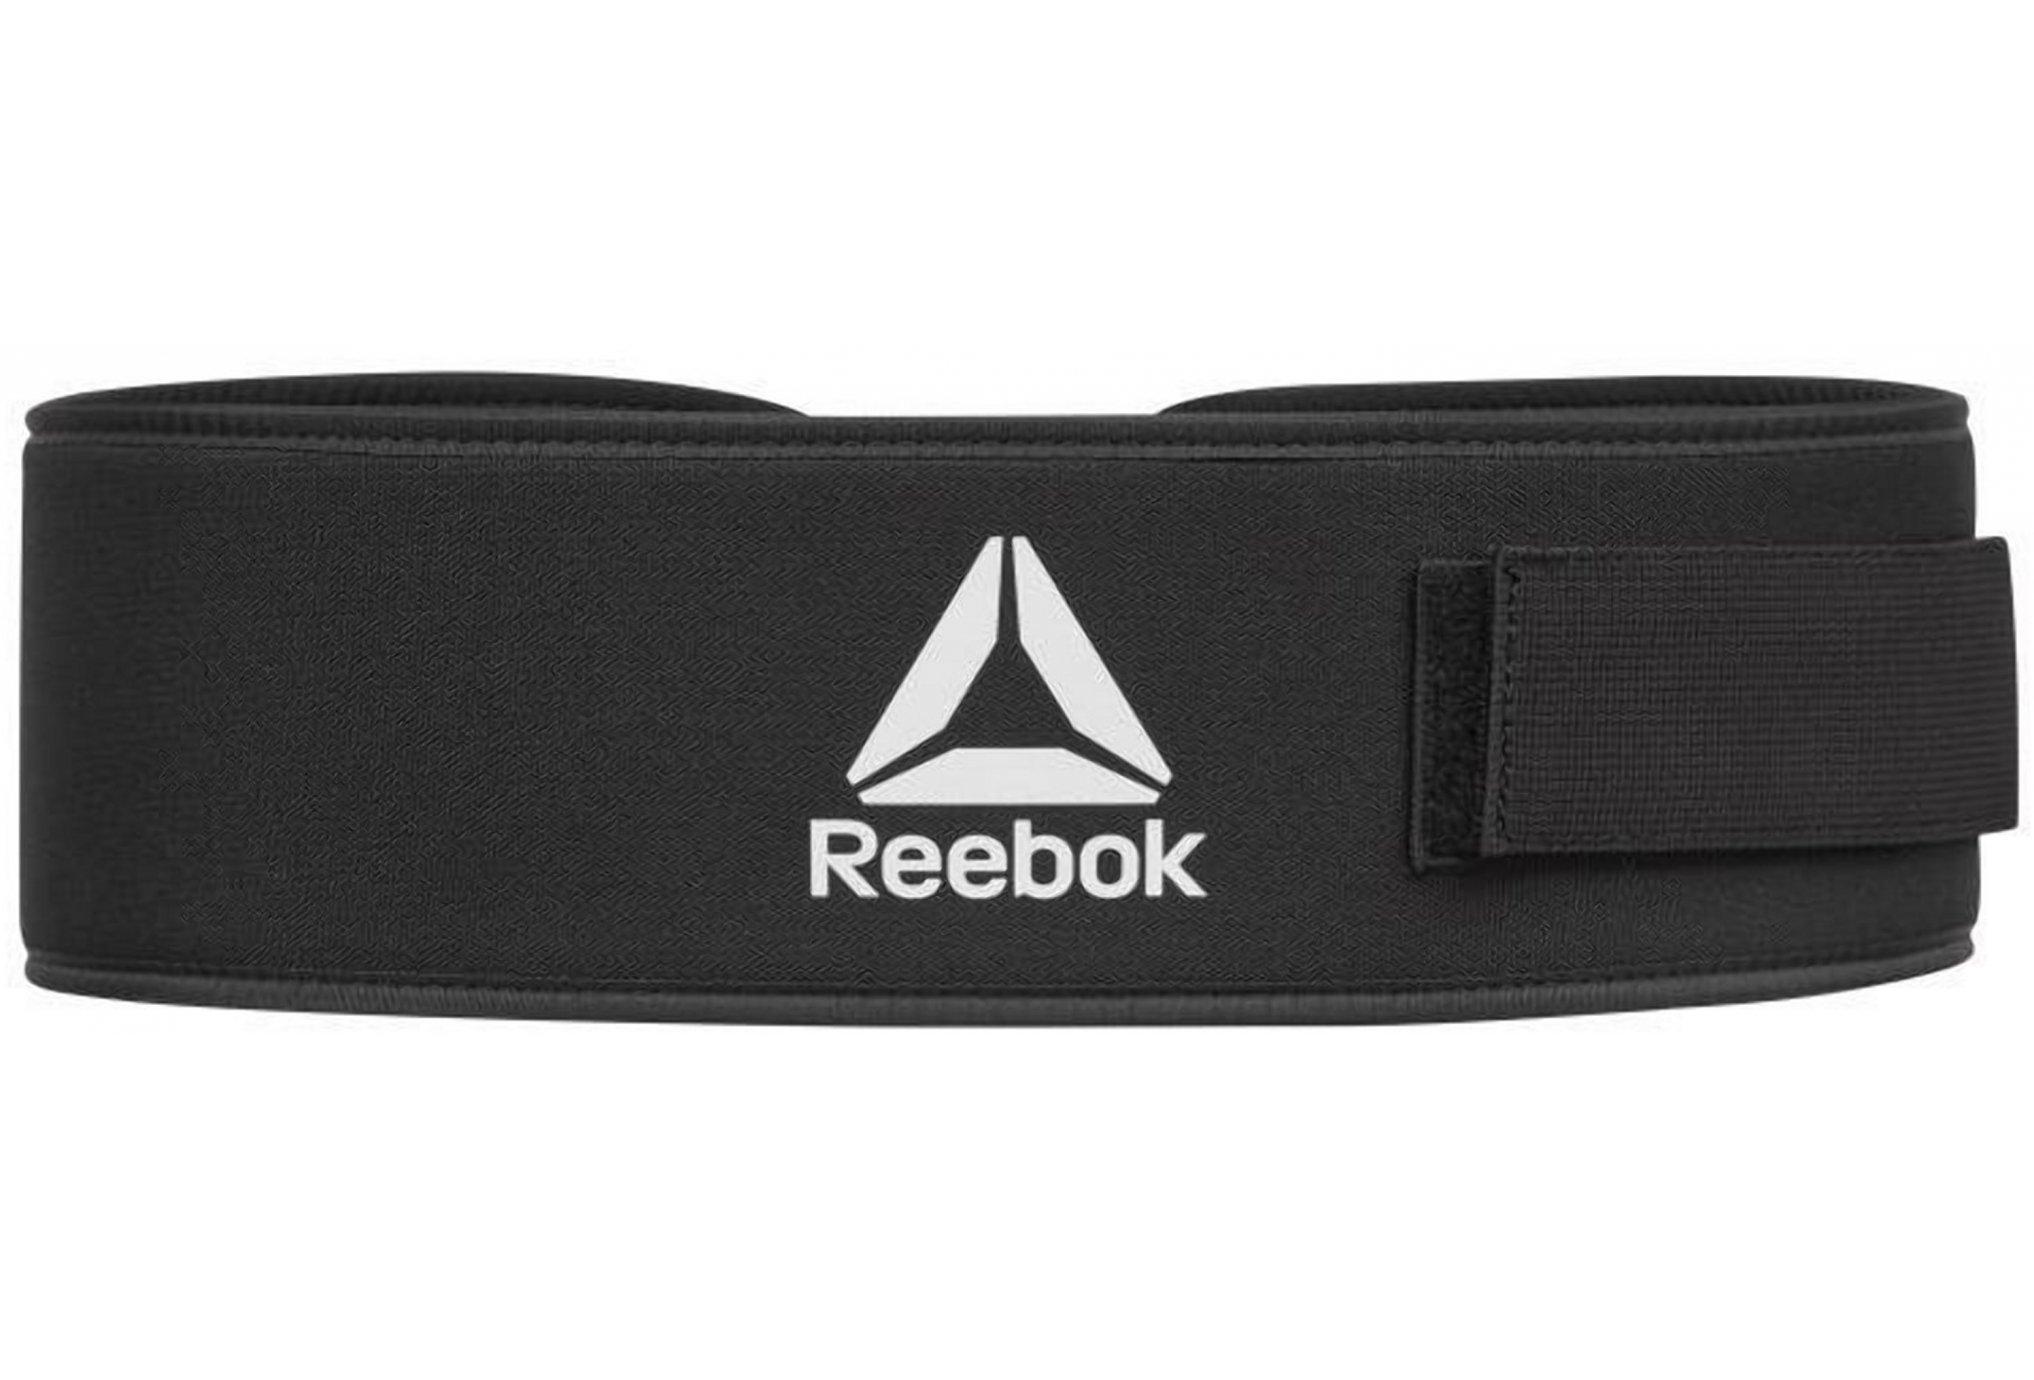 Reebok Weightlifting Belt Training